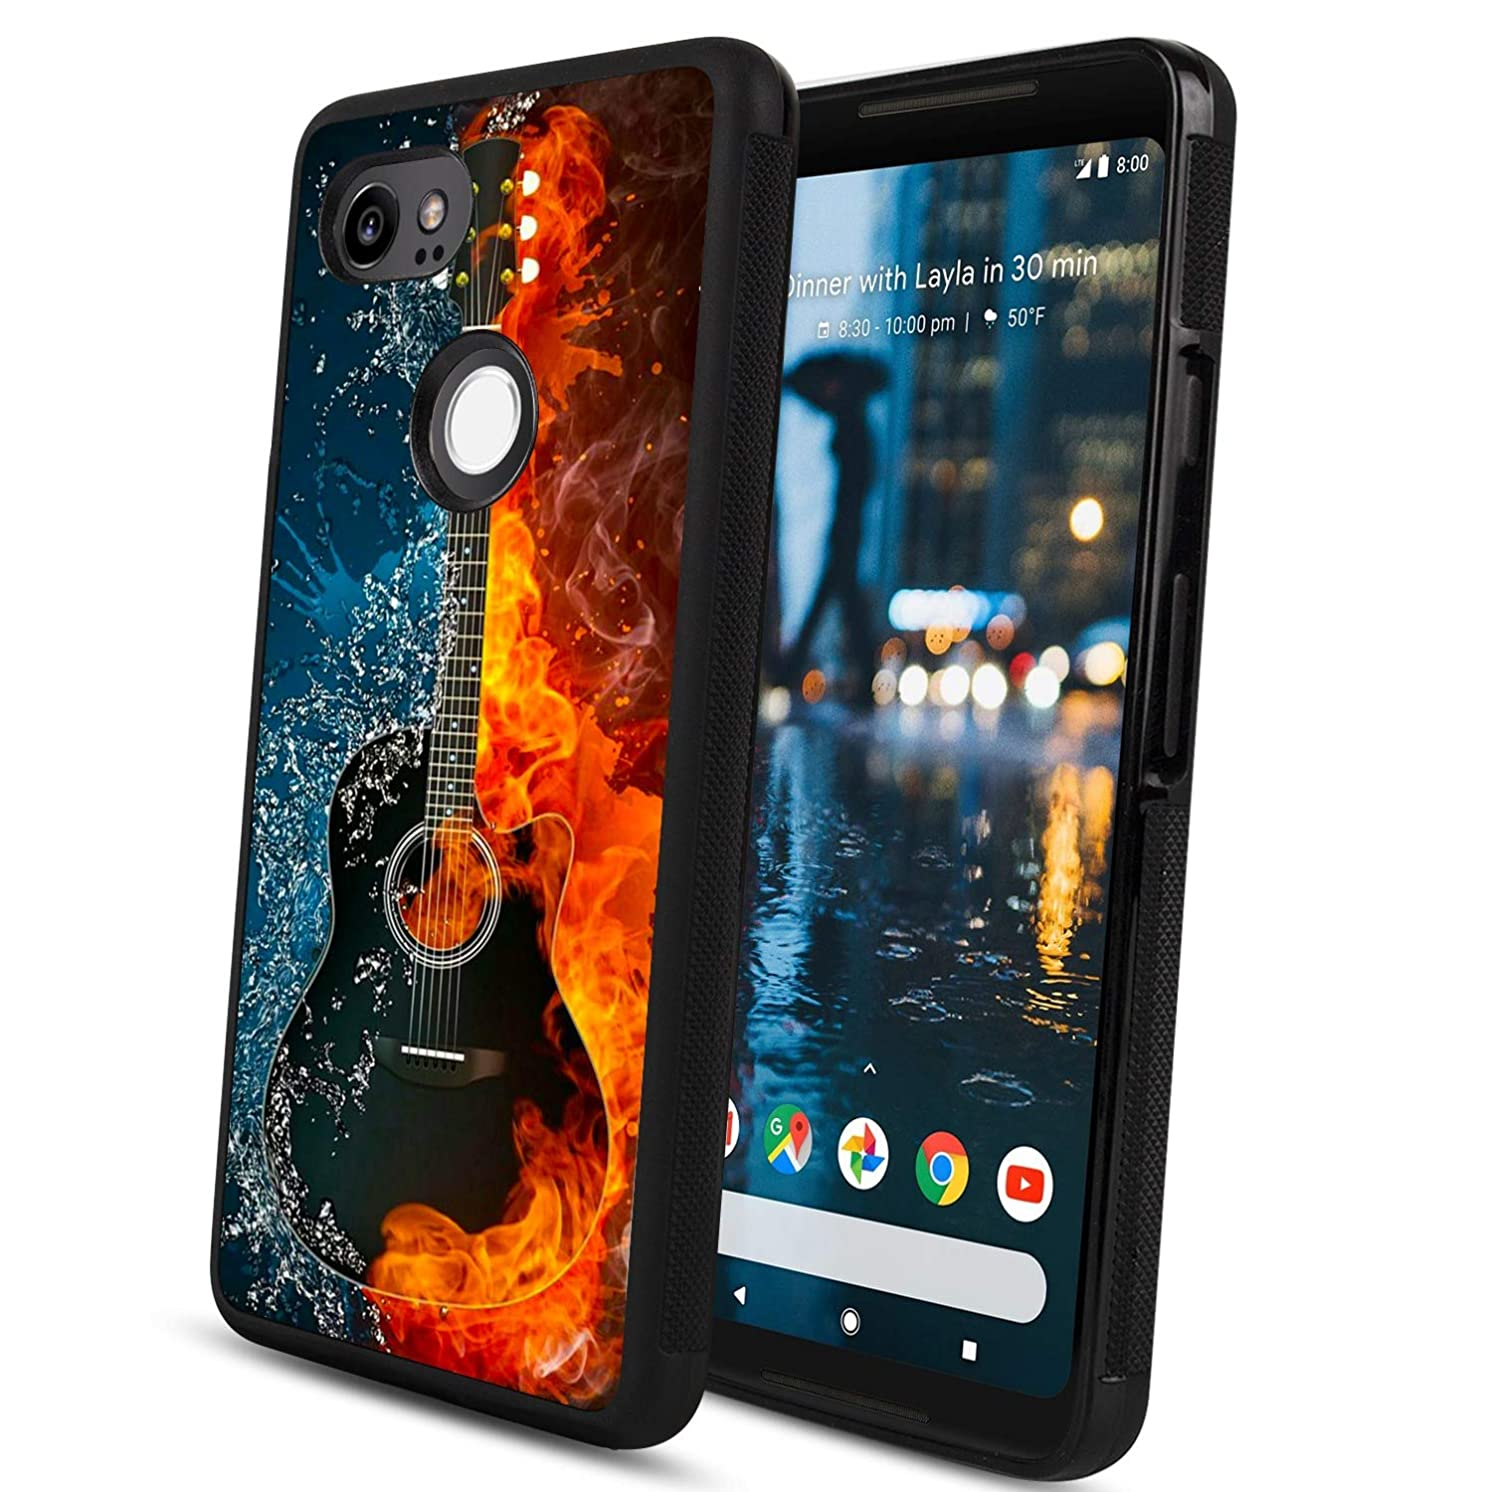 Google Pixel 2 XL Case Guitar on Fire Water Shock Absorption Shockproof Design Black TPU Case Protective Case